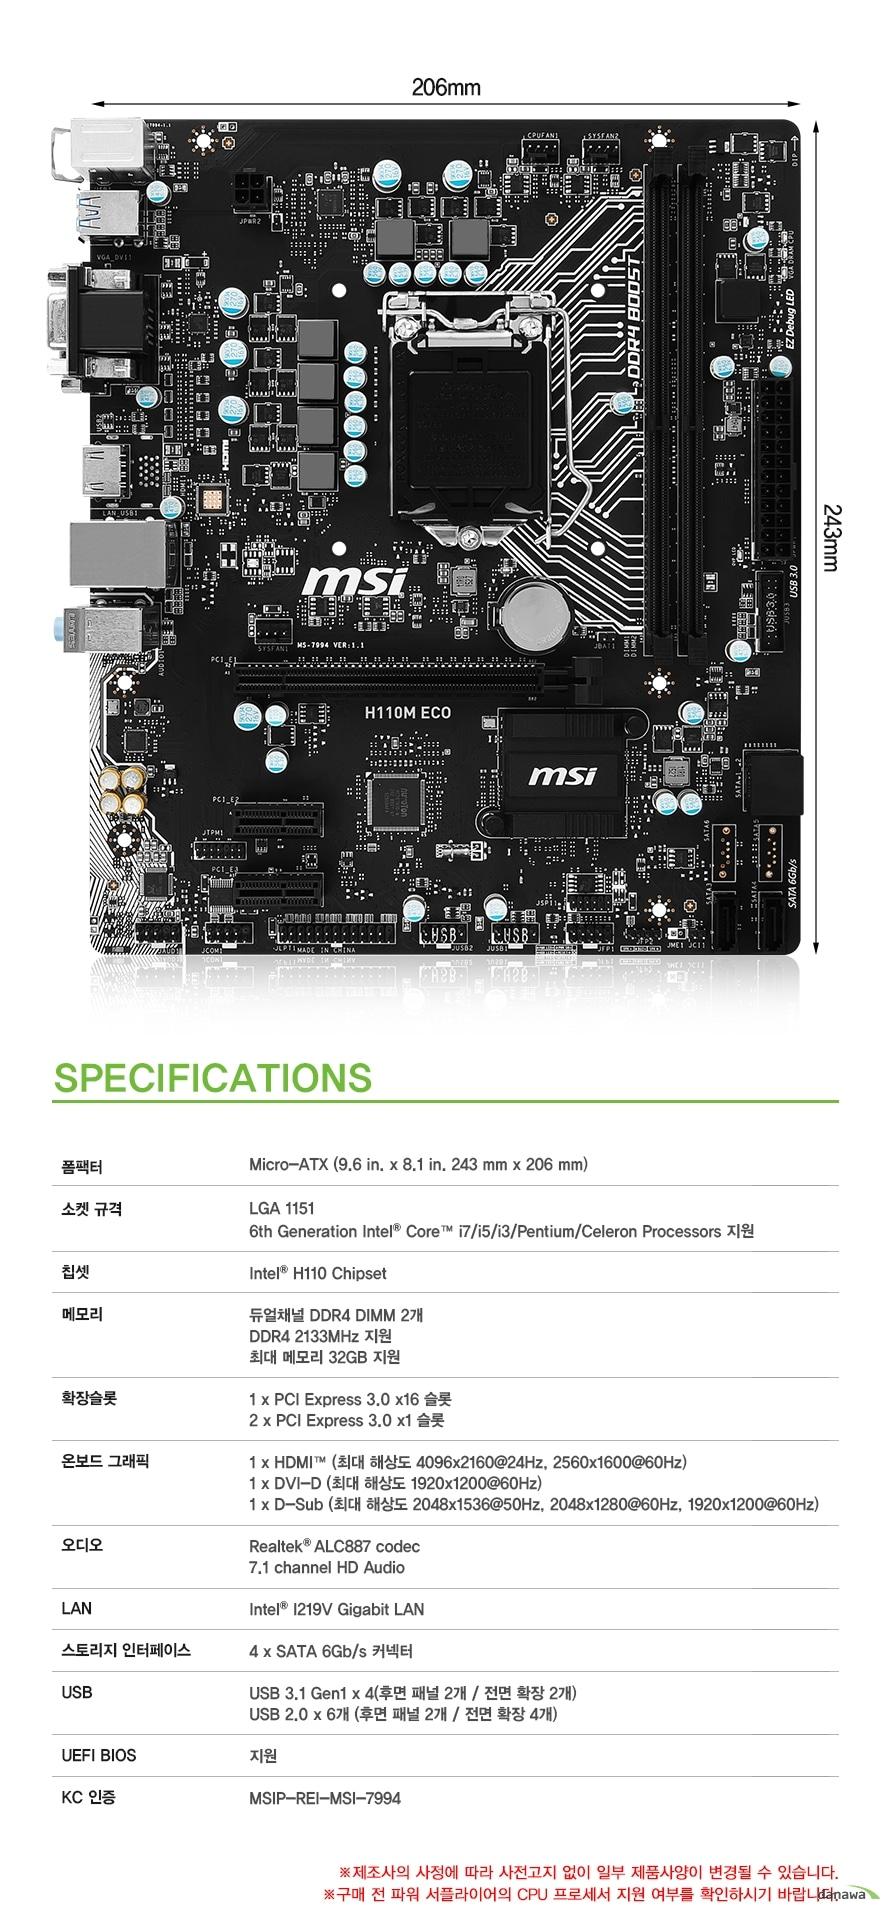 MSI H110M ECO 종합정보 행복쇼핑의 시작 ! 다나와 (가격비교) - Danawa.com